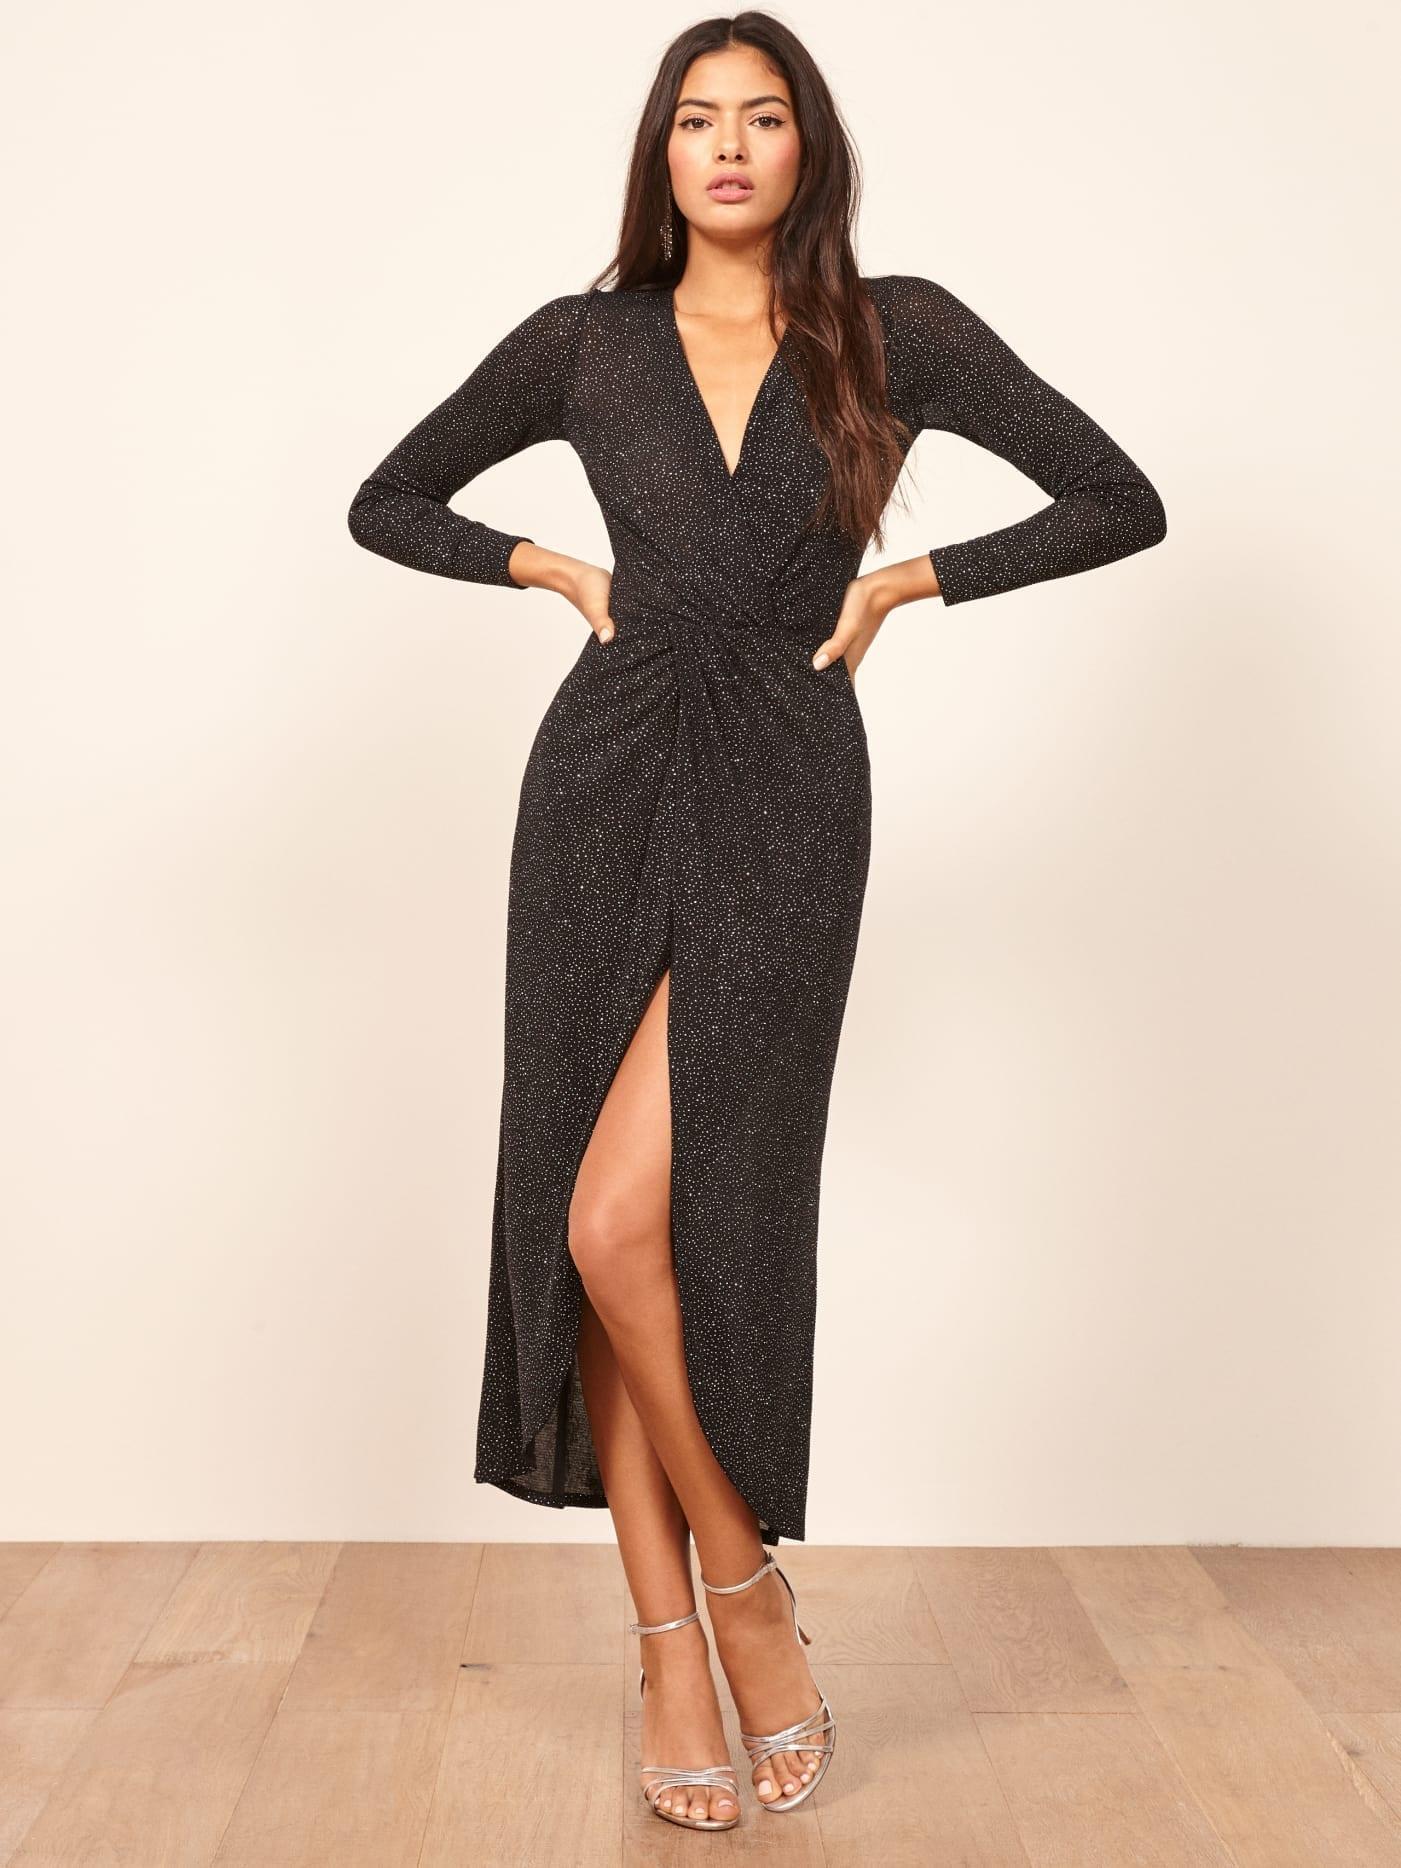 REFORMATION Carlyle Black Dress